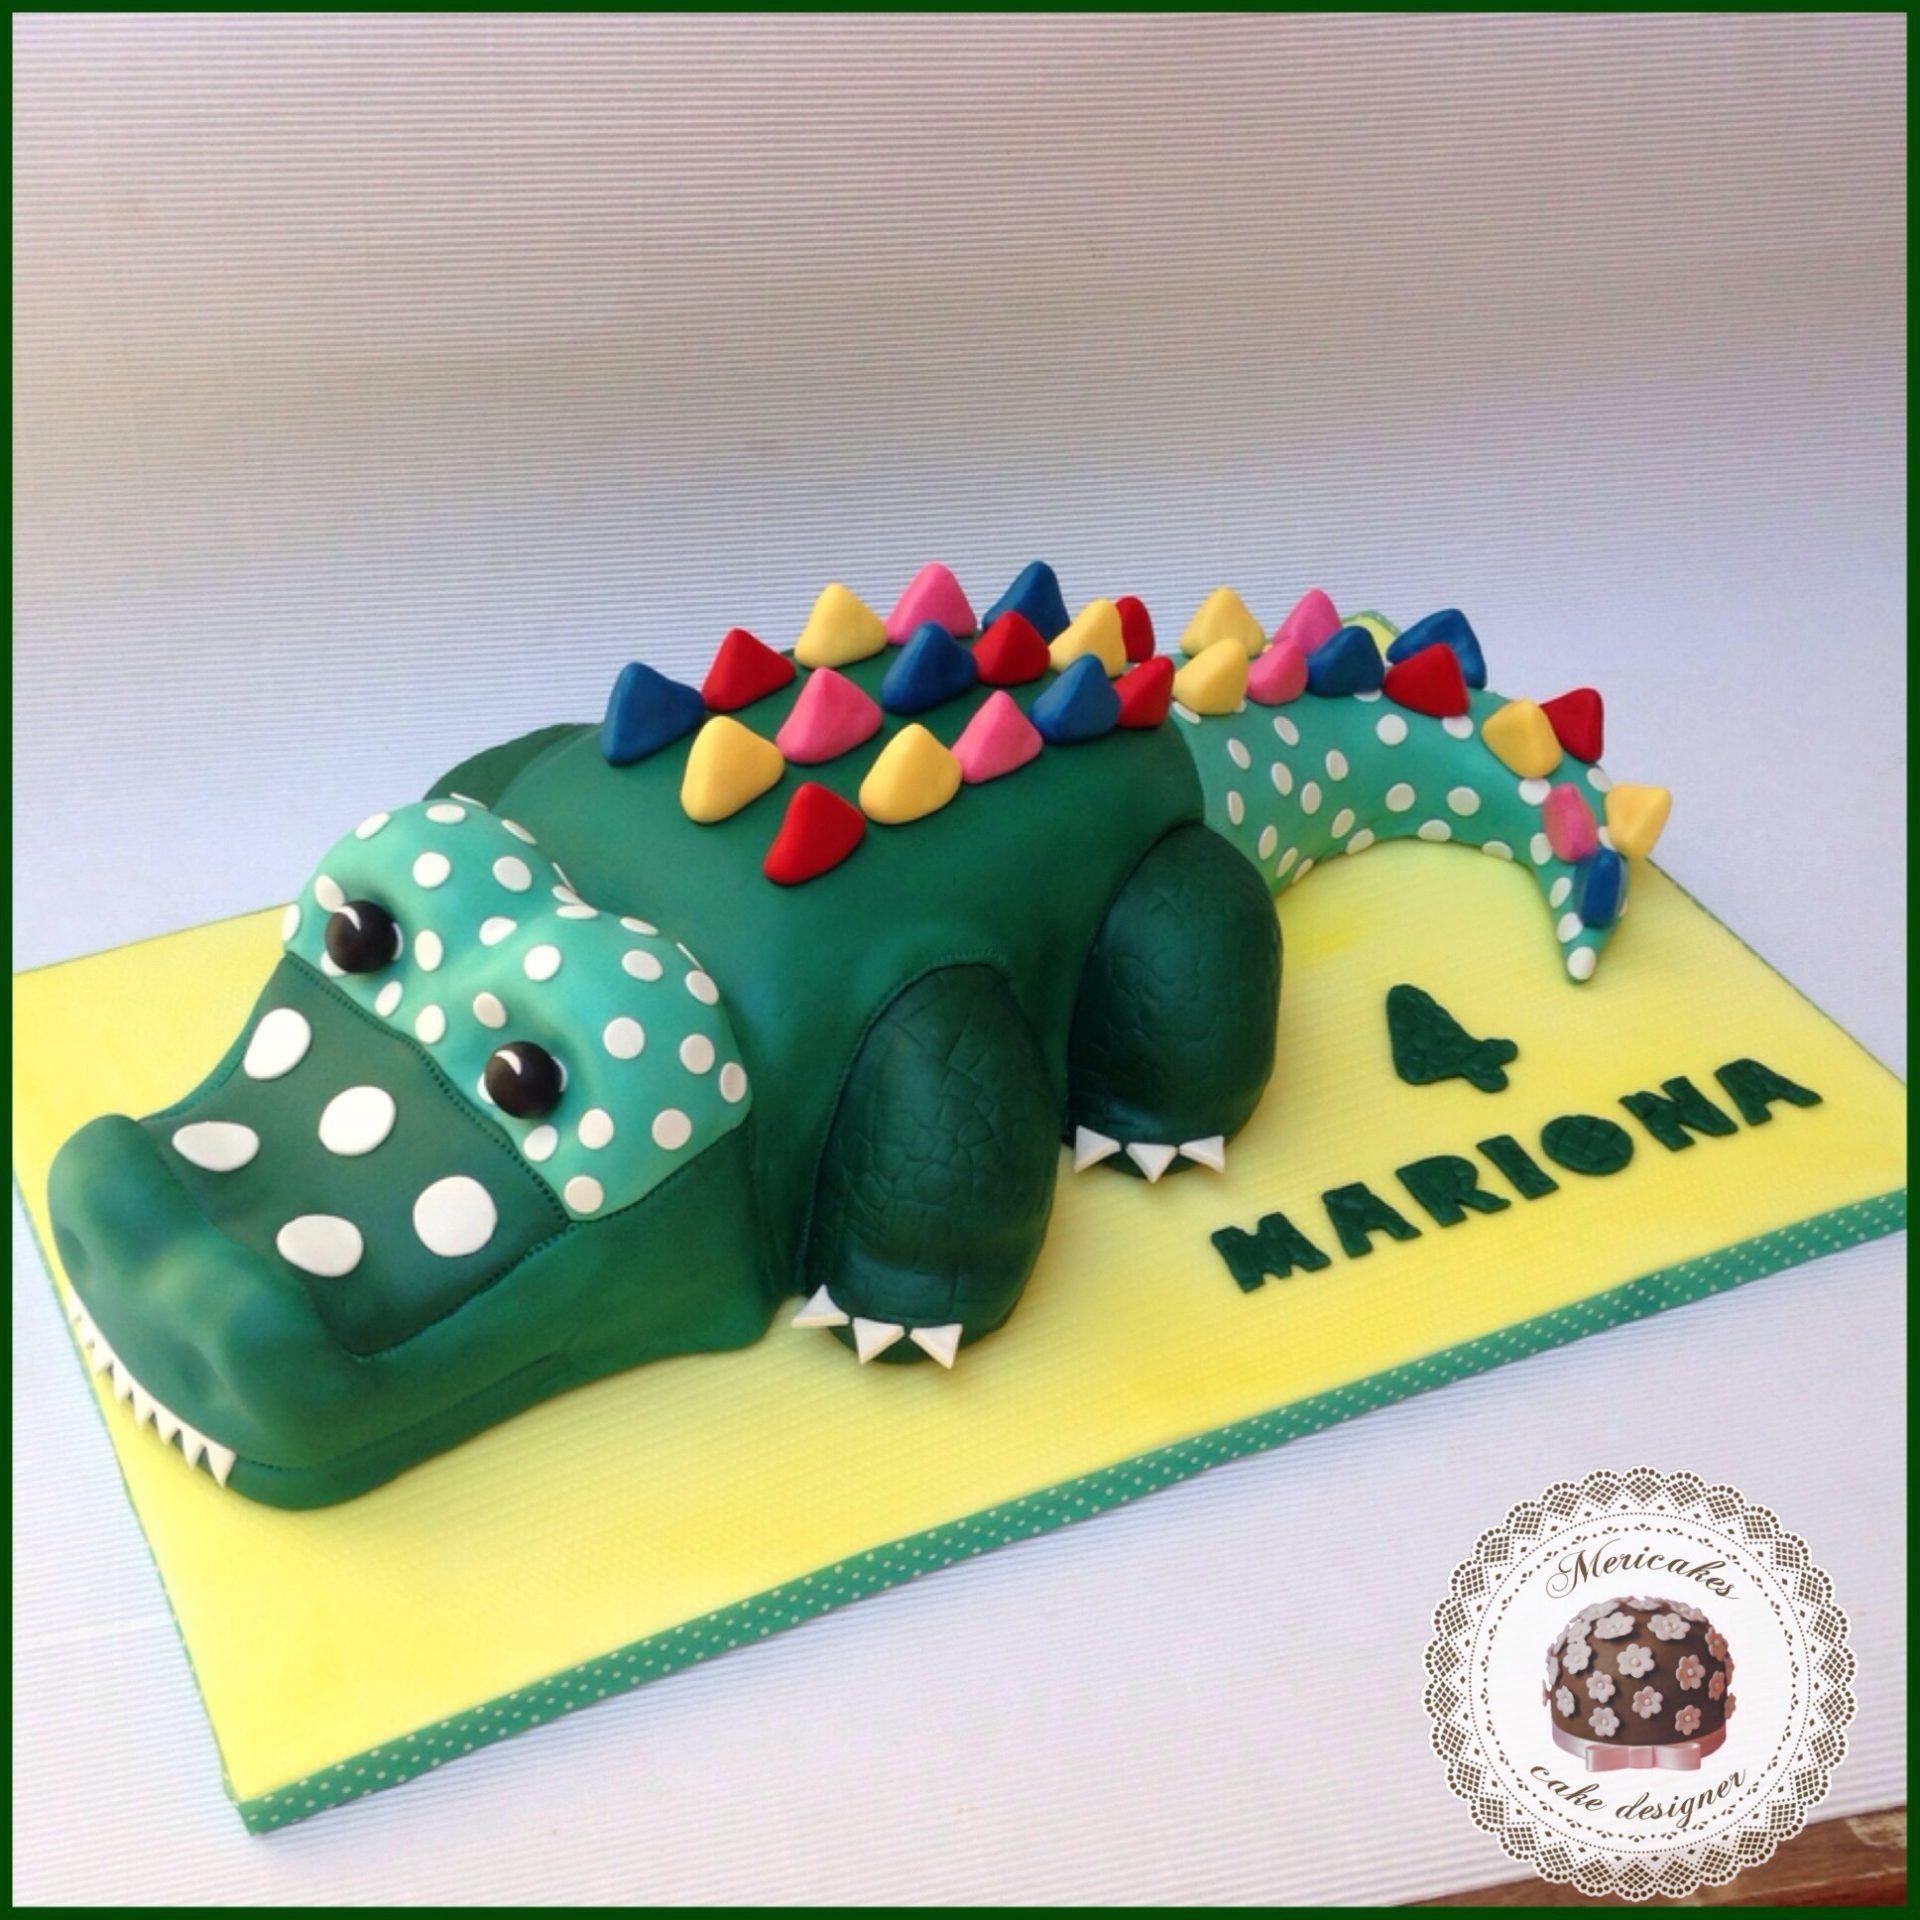 barcelona-catalunya-cocodrilo-colours-crocodile-cute-cake-dots-fondant-fondant-cake-frambuesa-infantil-kawaii-cake-mericakes-pastel-cumpleanos-pistachio-pi